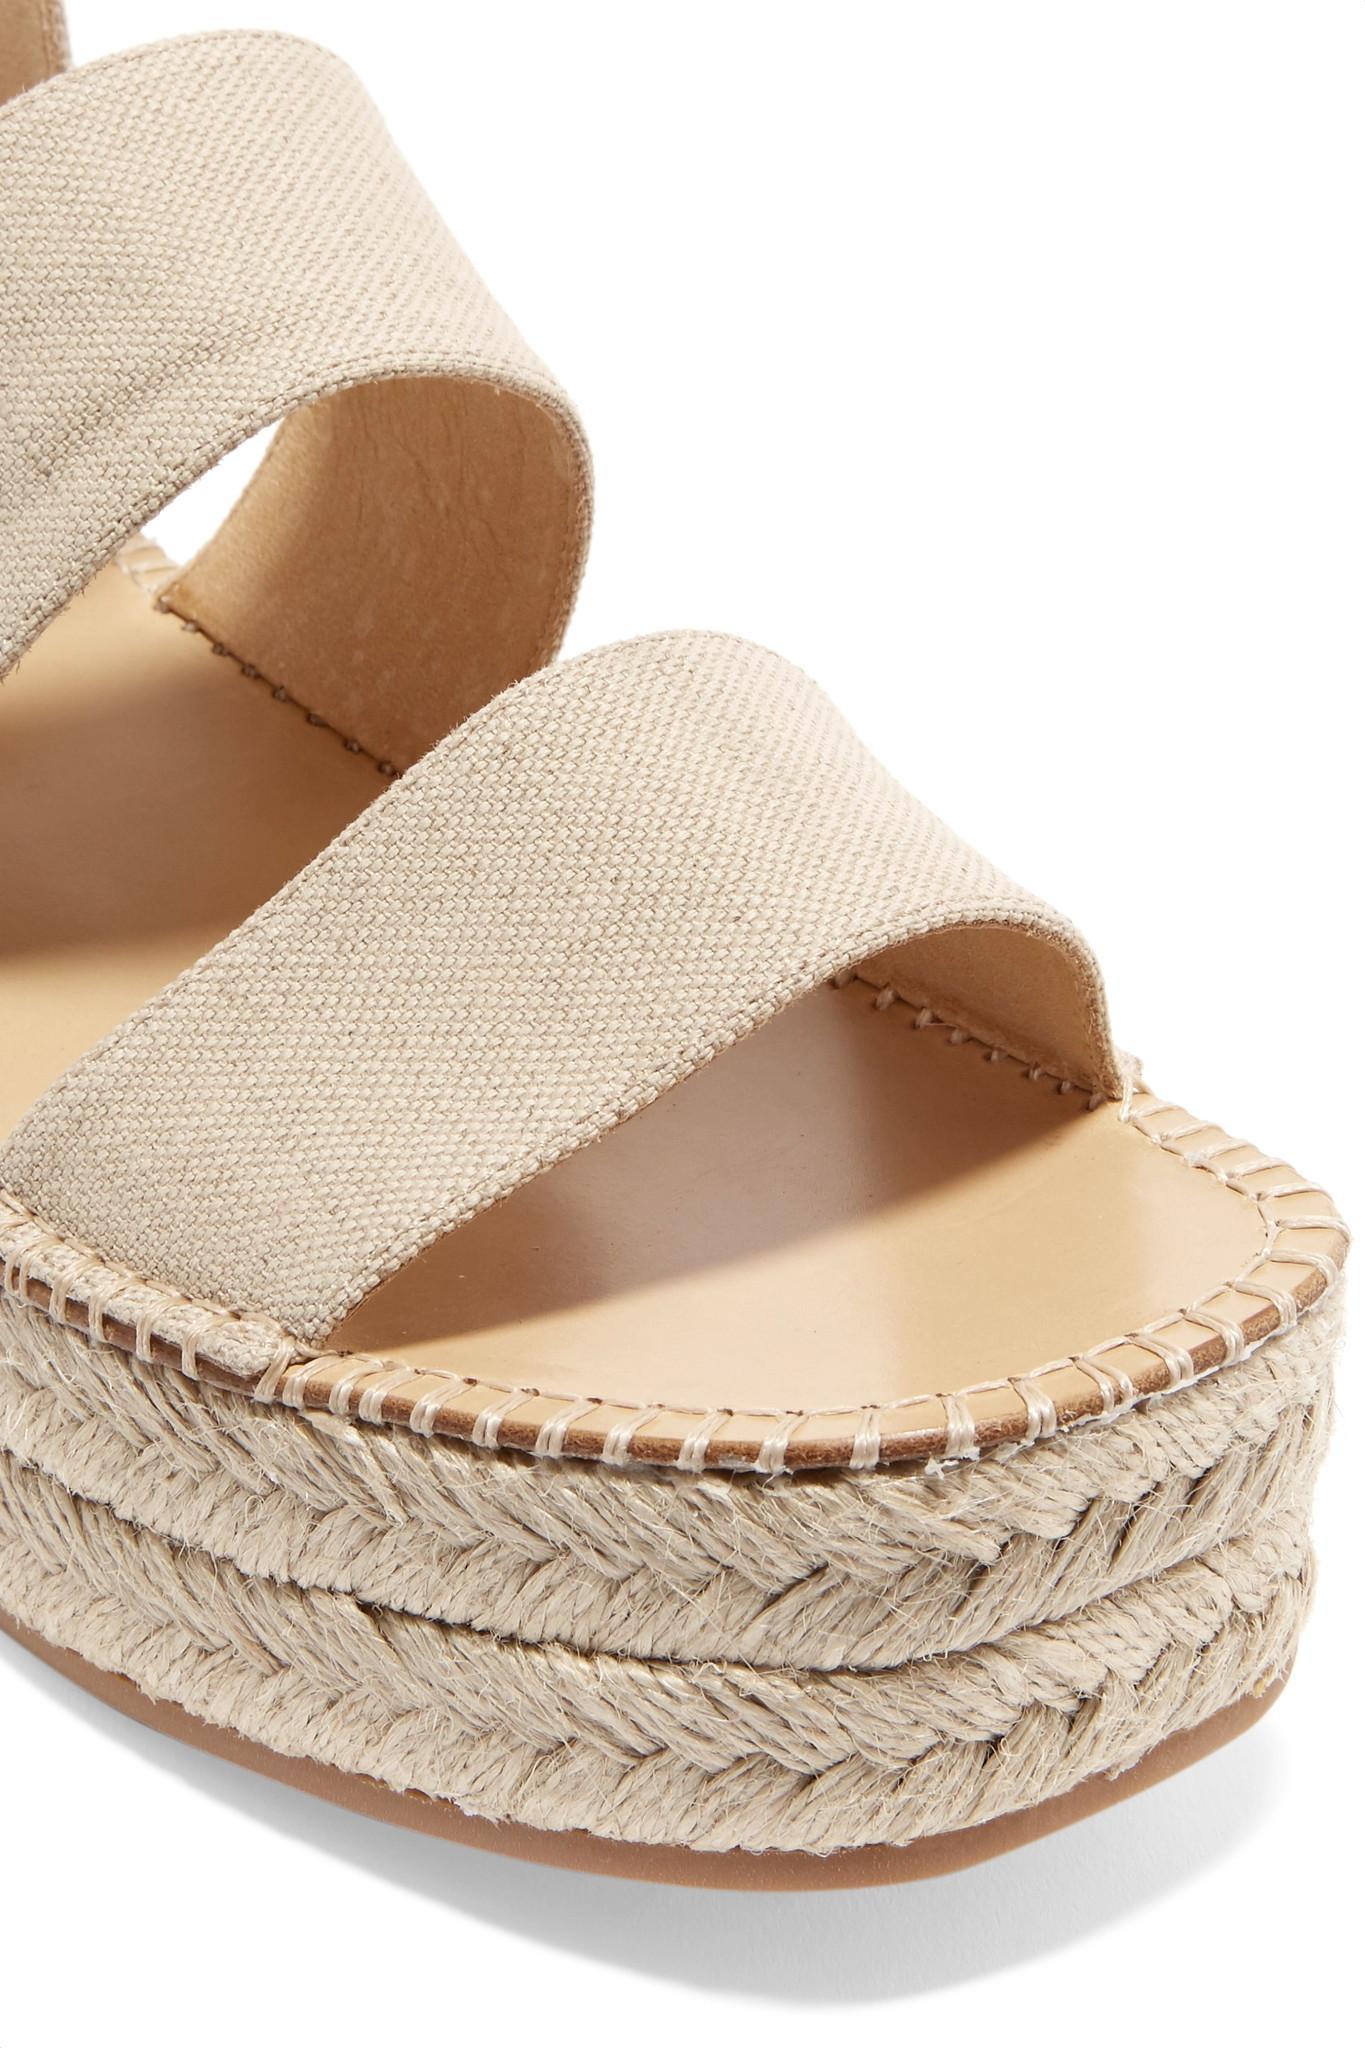 abd652386d5 Lyst - Rag   Bone Woman Tara Canvas Platform Espadrille Sandals ...